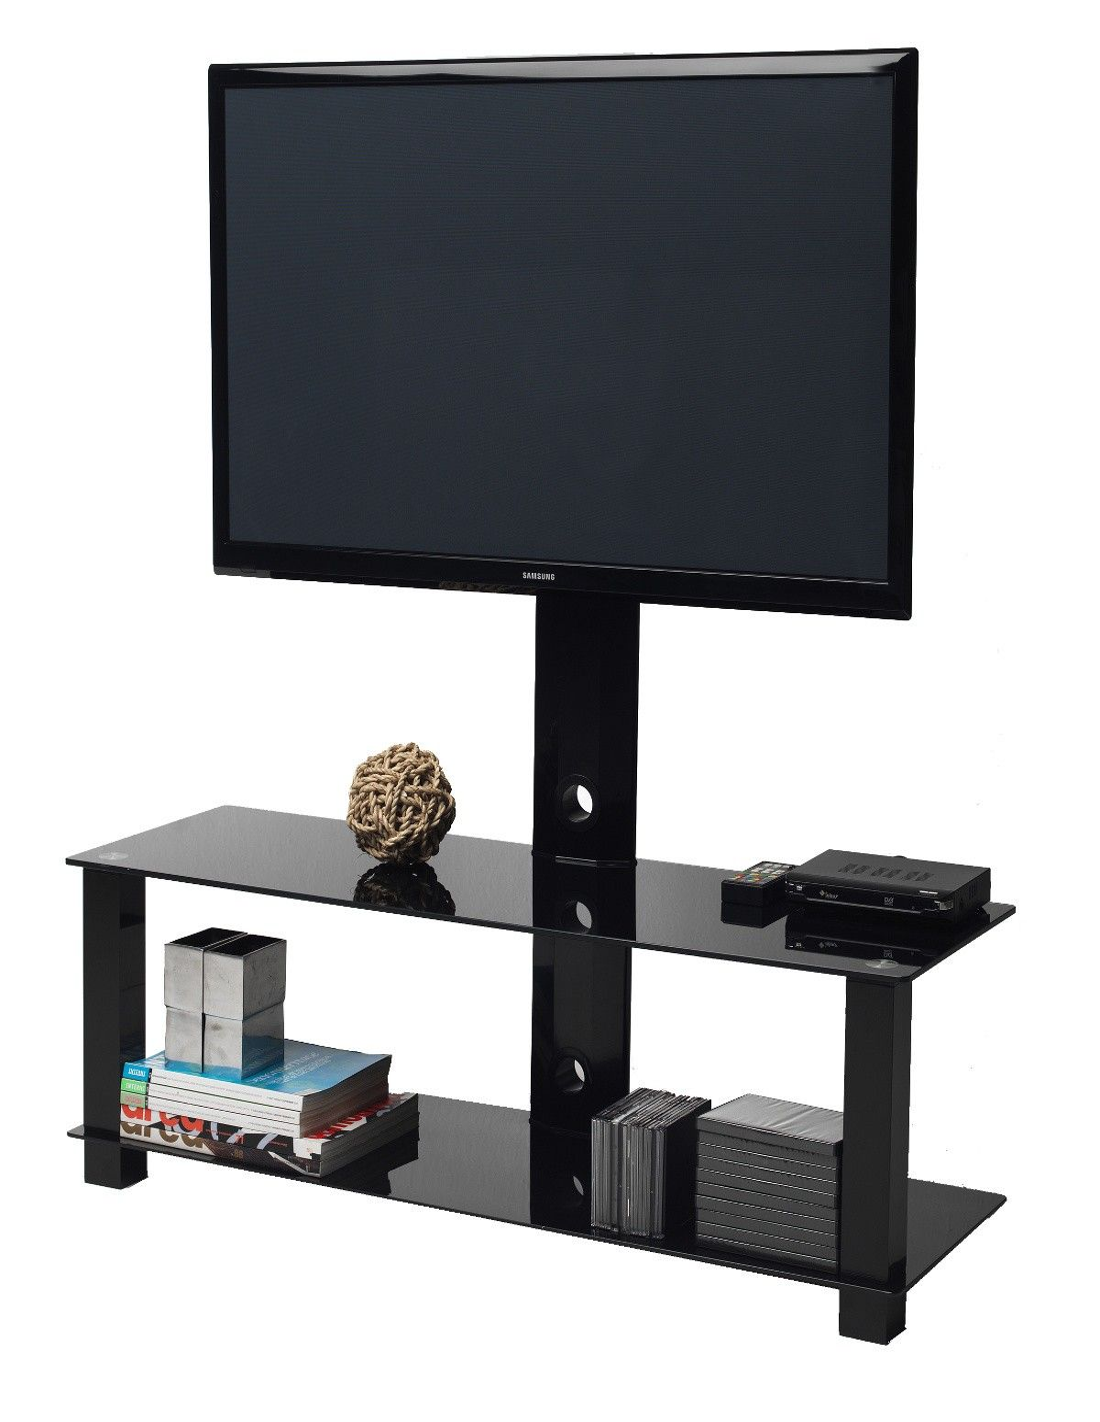 mobili porta tv lcd dal design moderno - Mobili Tv Bassi Moderni